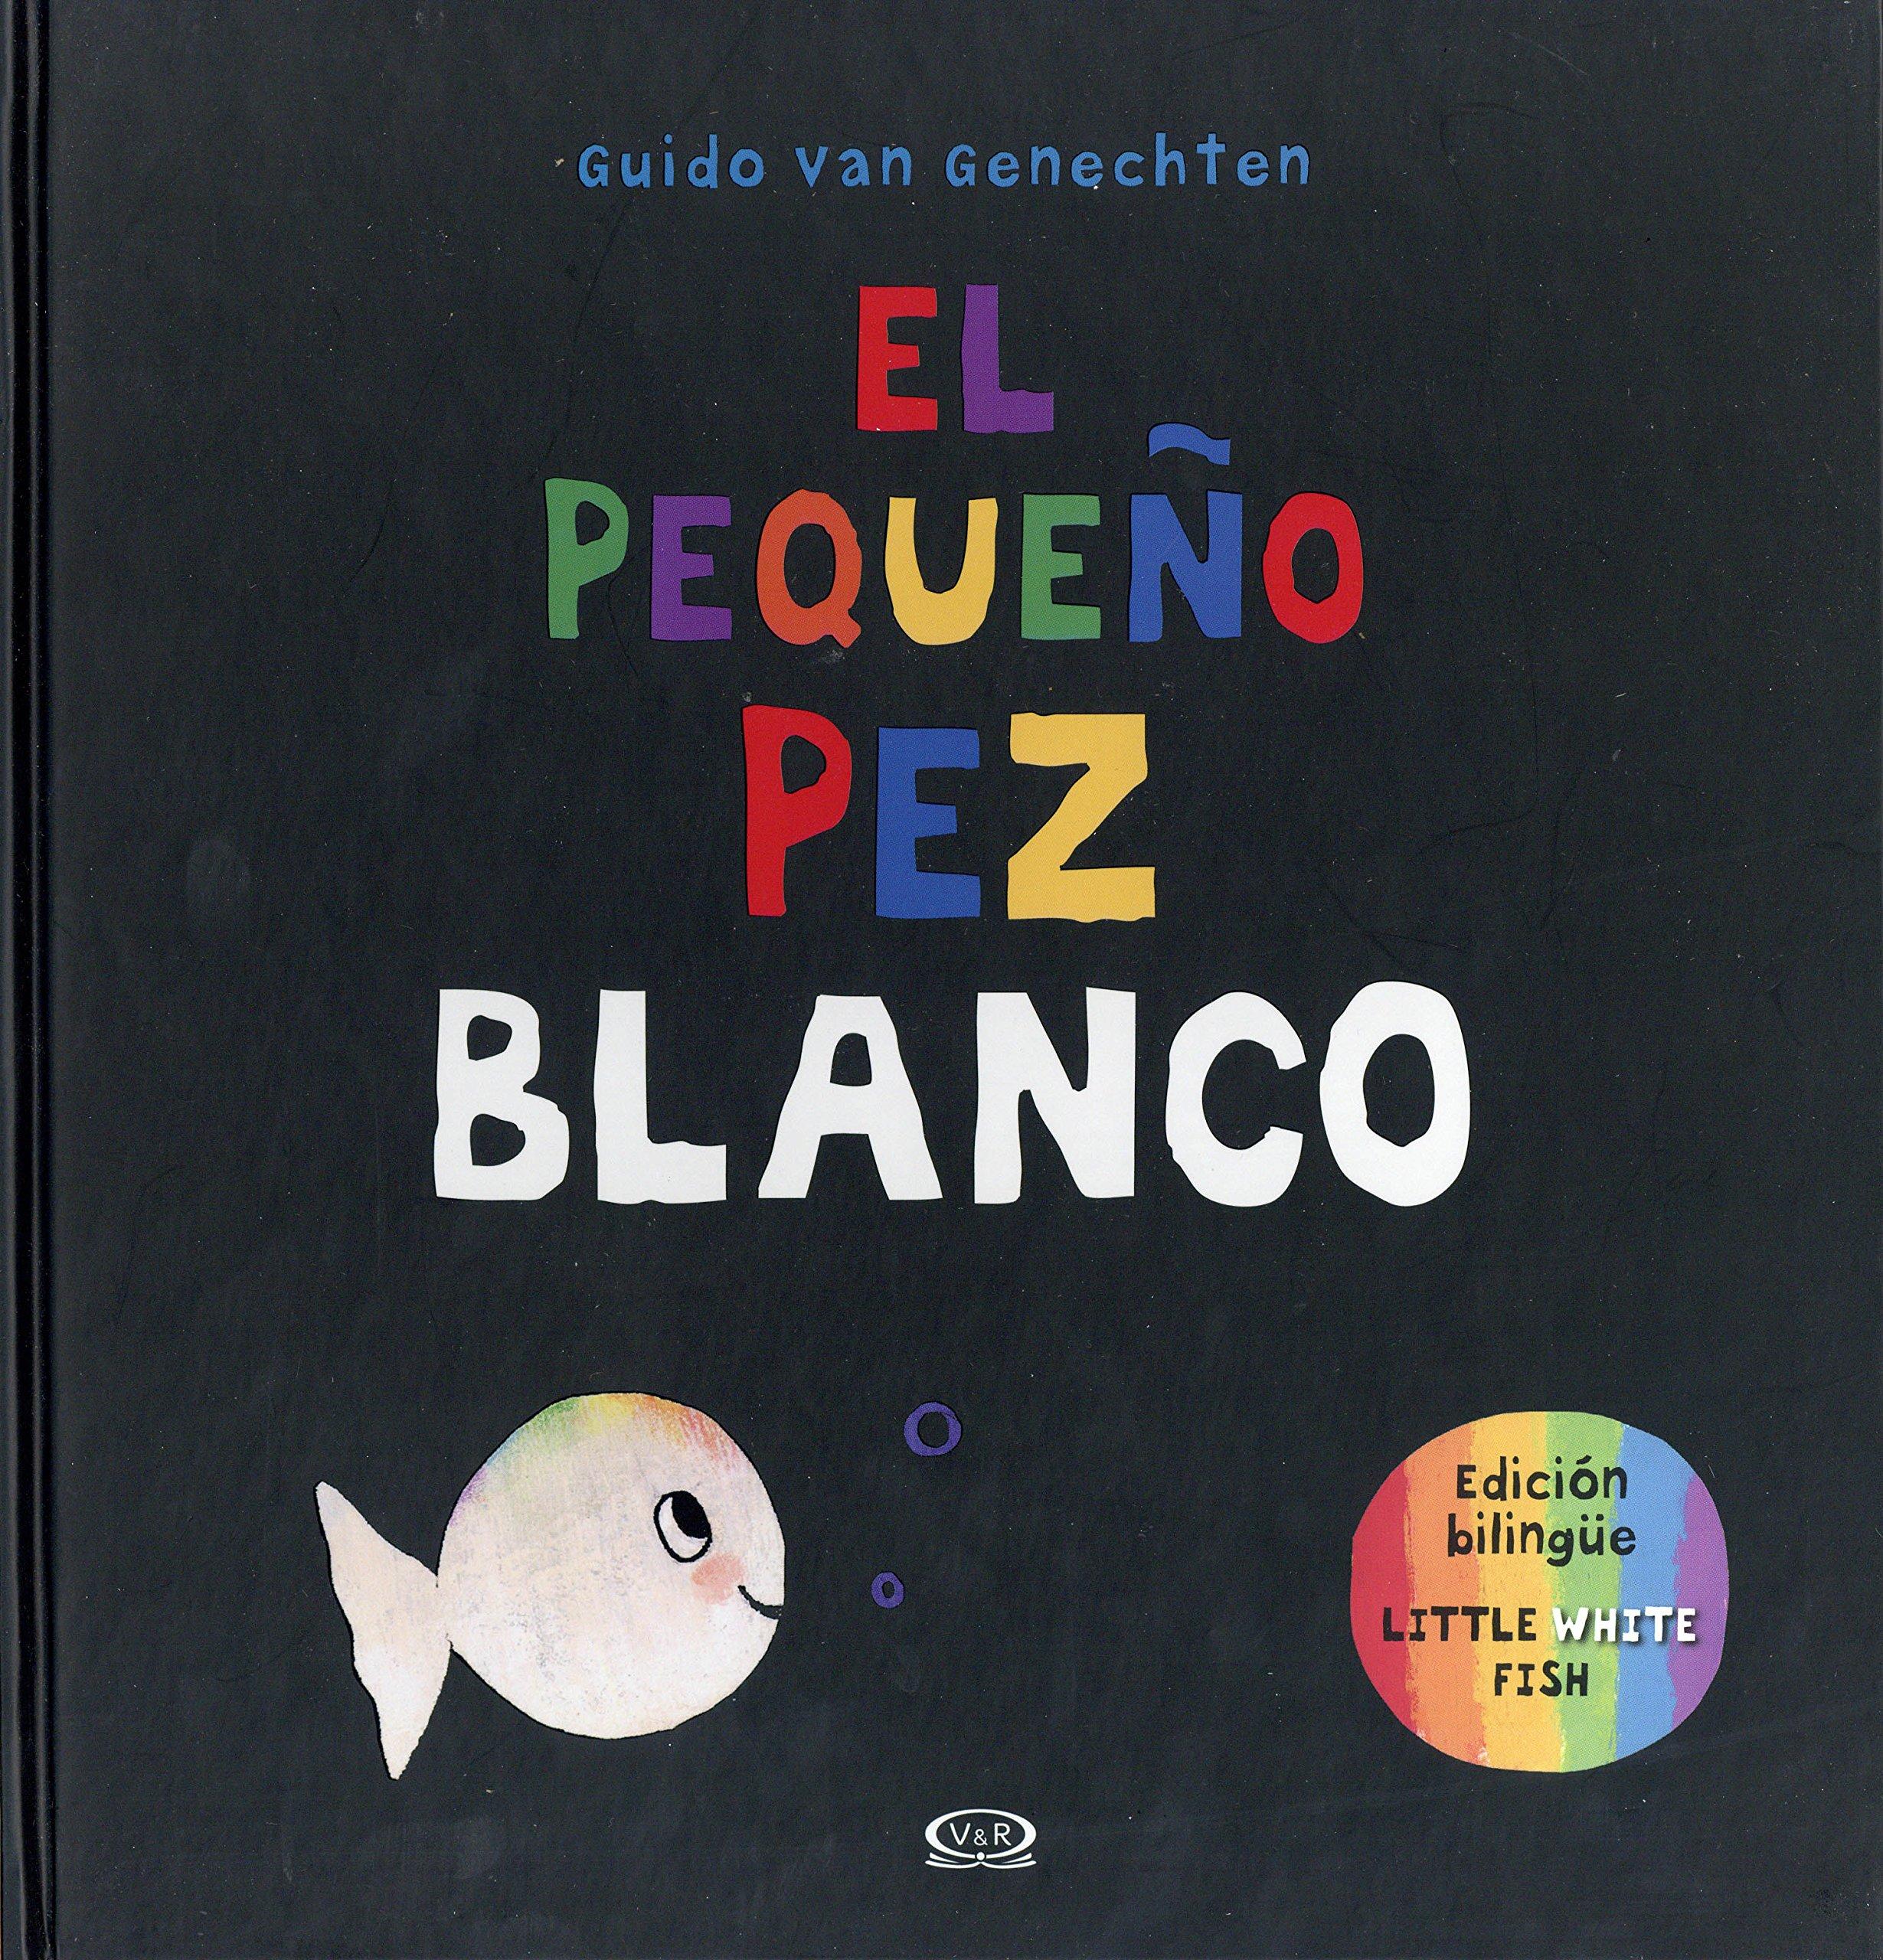 El pequeño pez blanco (Spanish Edition) (Spanish and English Edition)